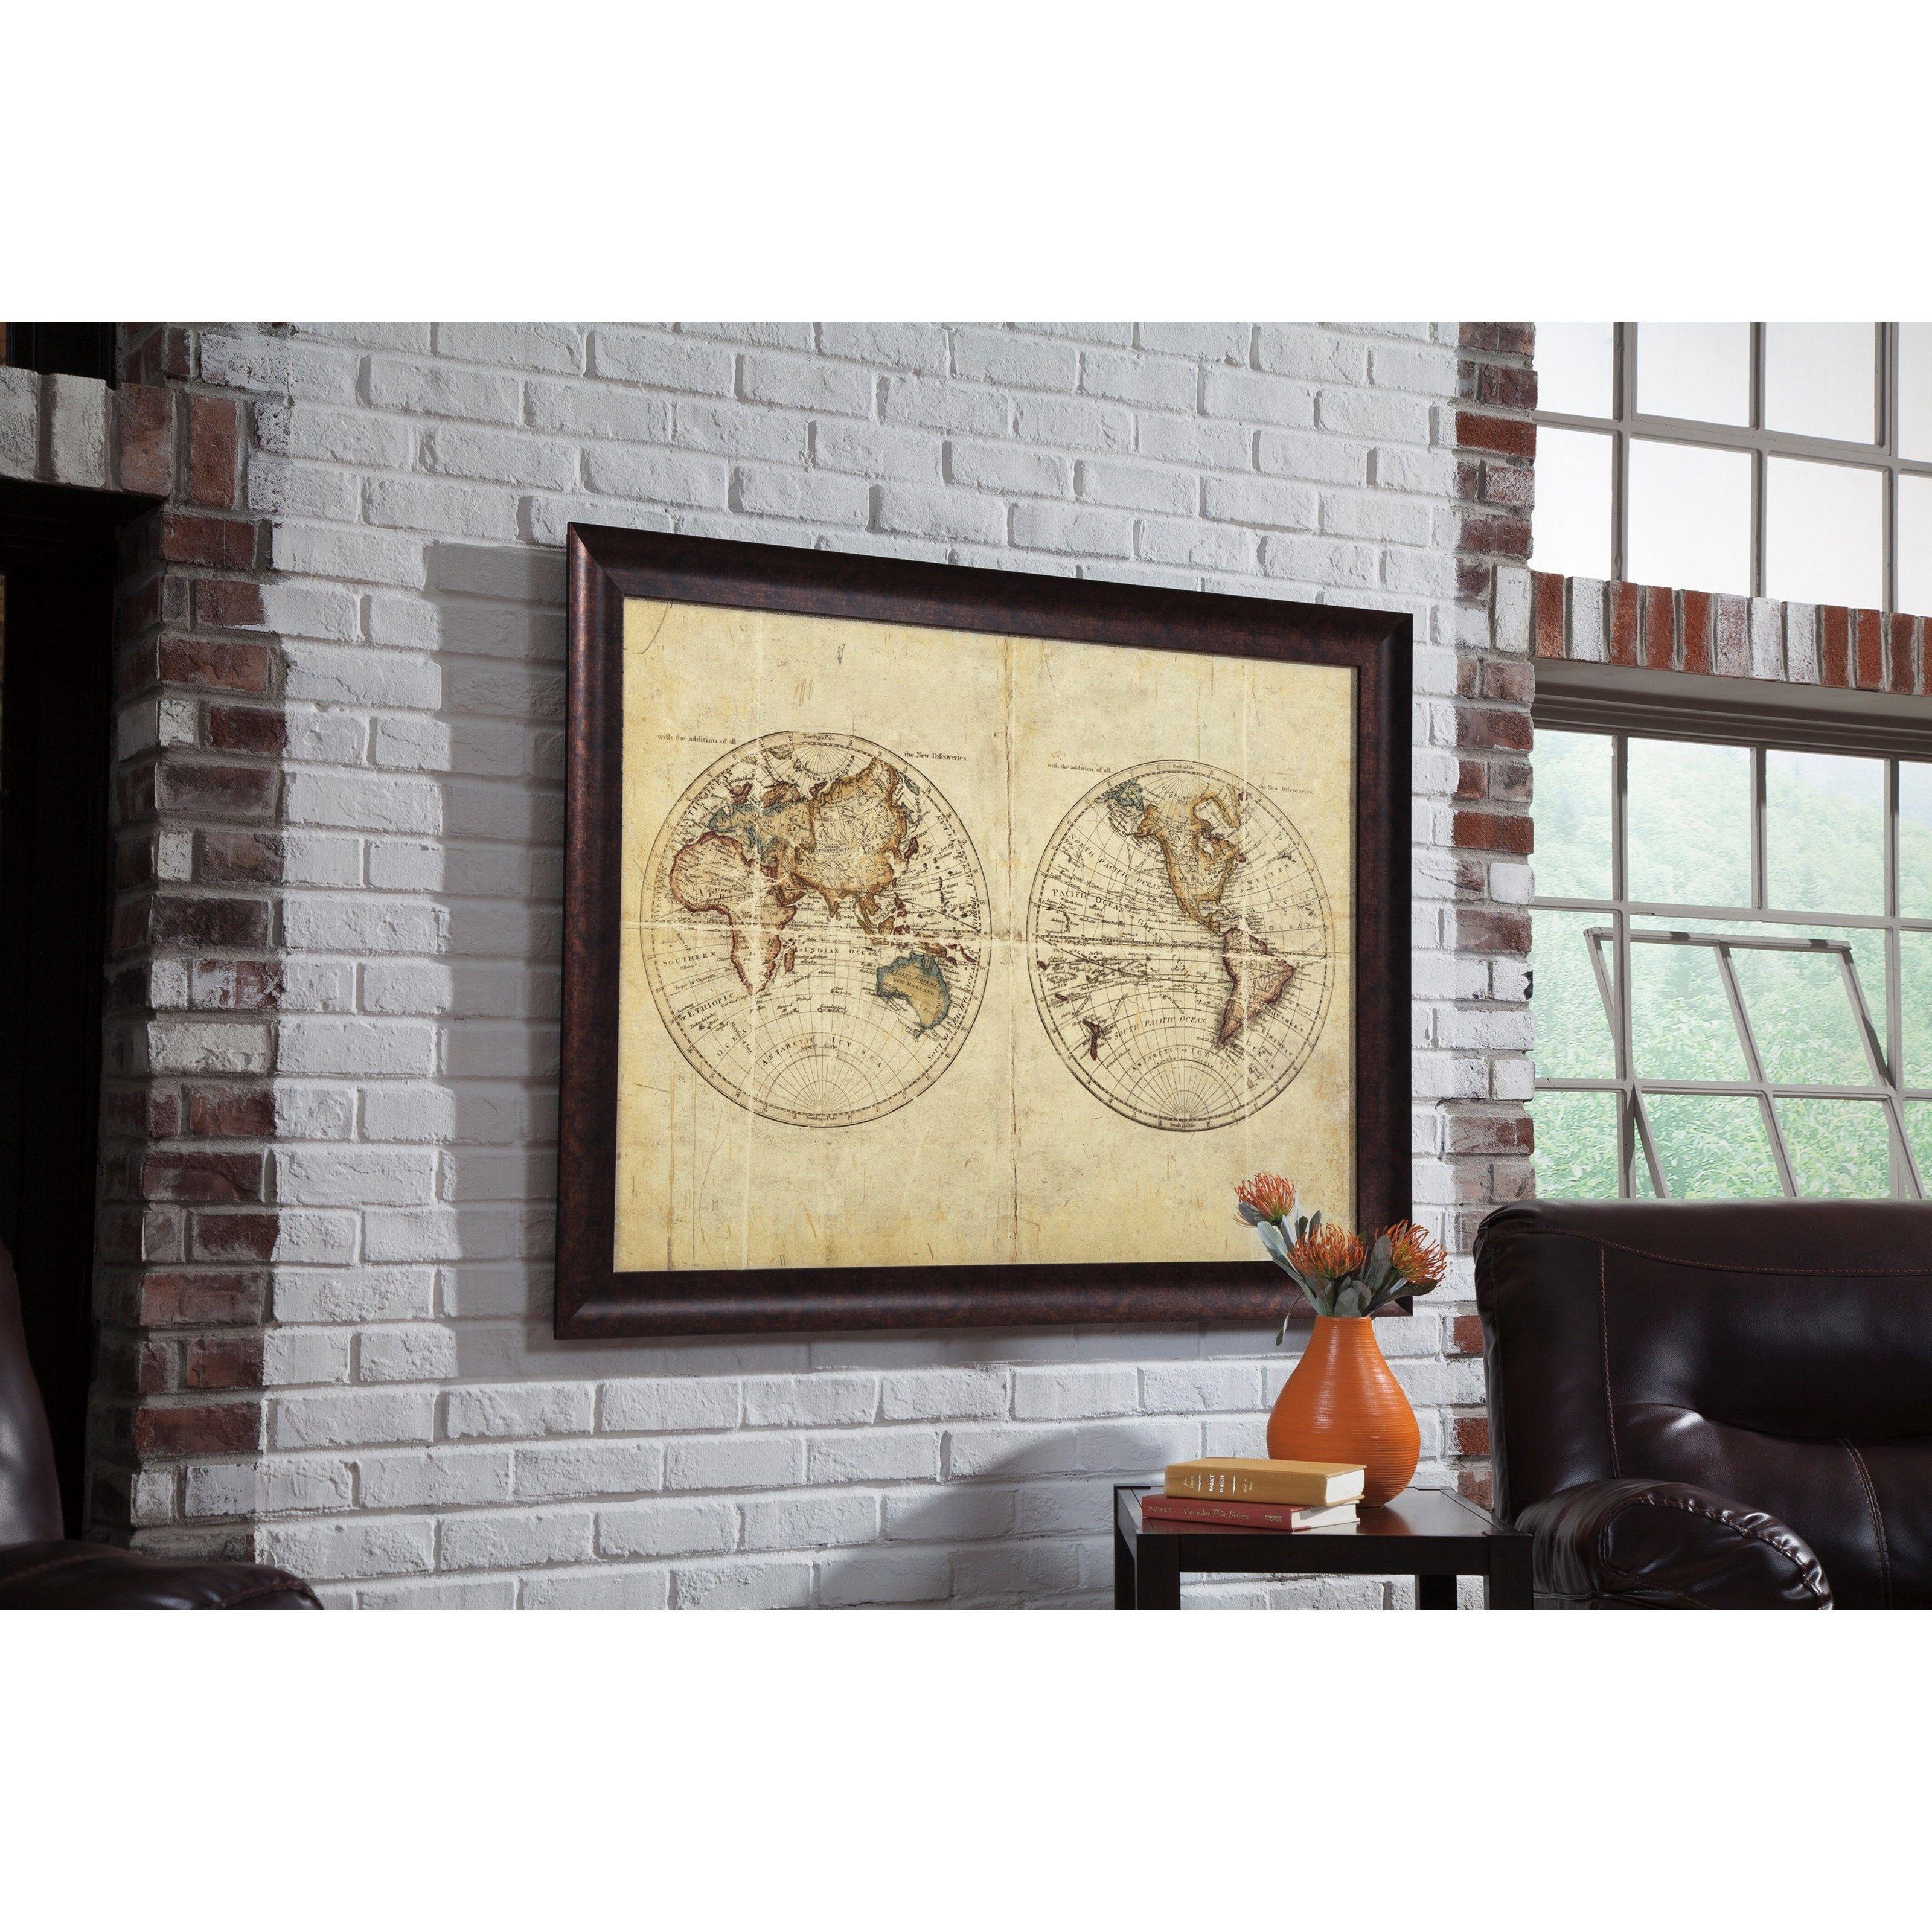 Wall art barhloew multi wall art map design in shades of tan brown